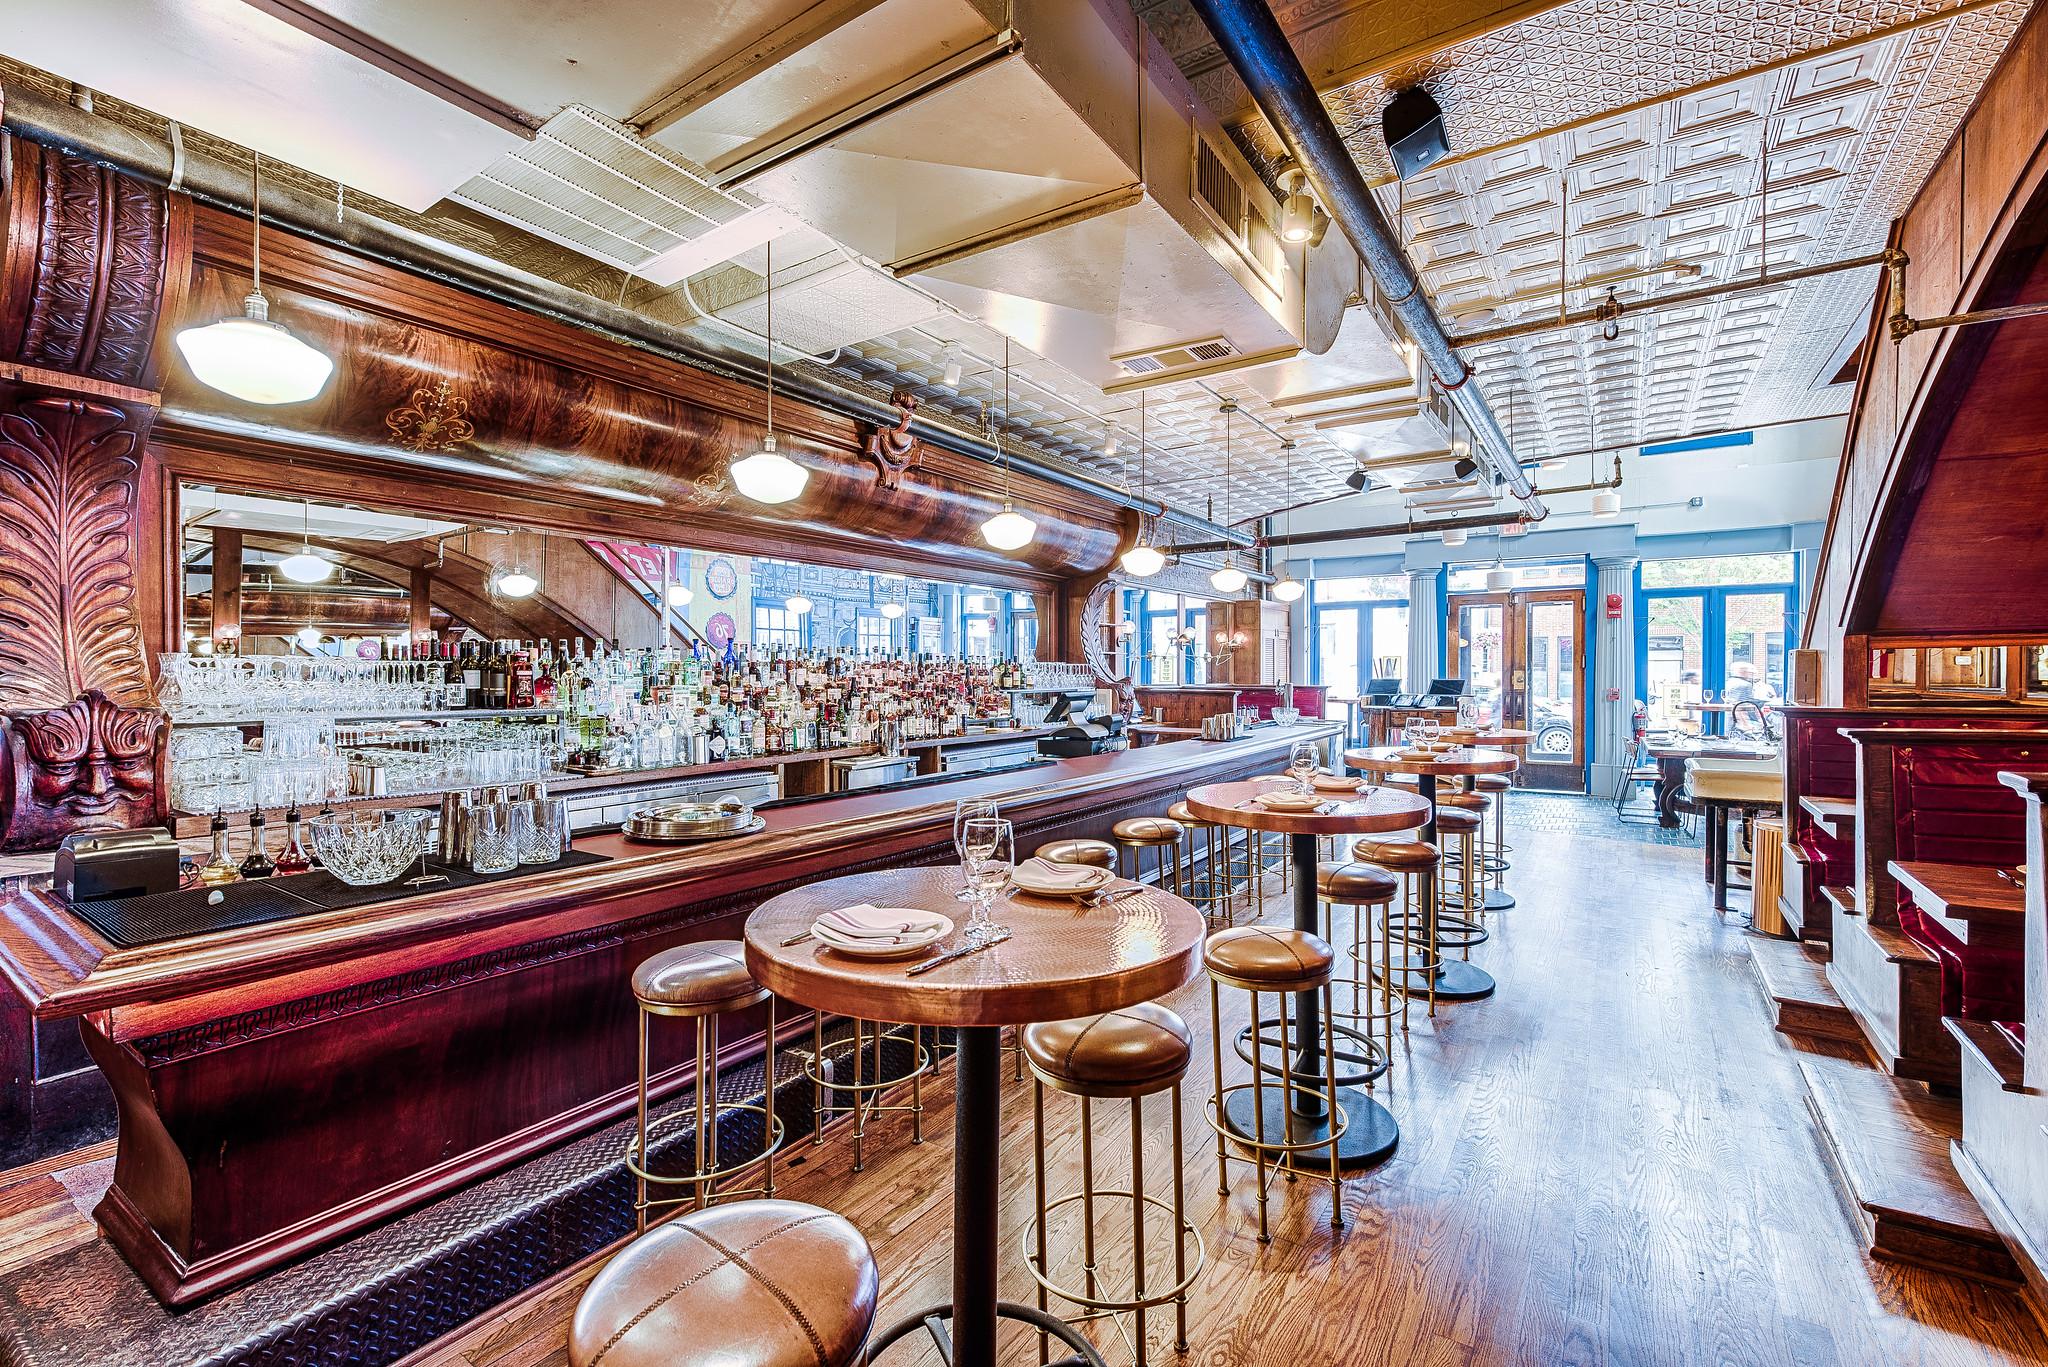 9-studio-saint-bars-and-restaurants-america-eats-tavern-washington-dc-lopez.jpg